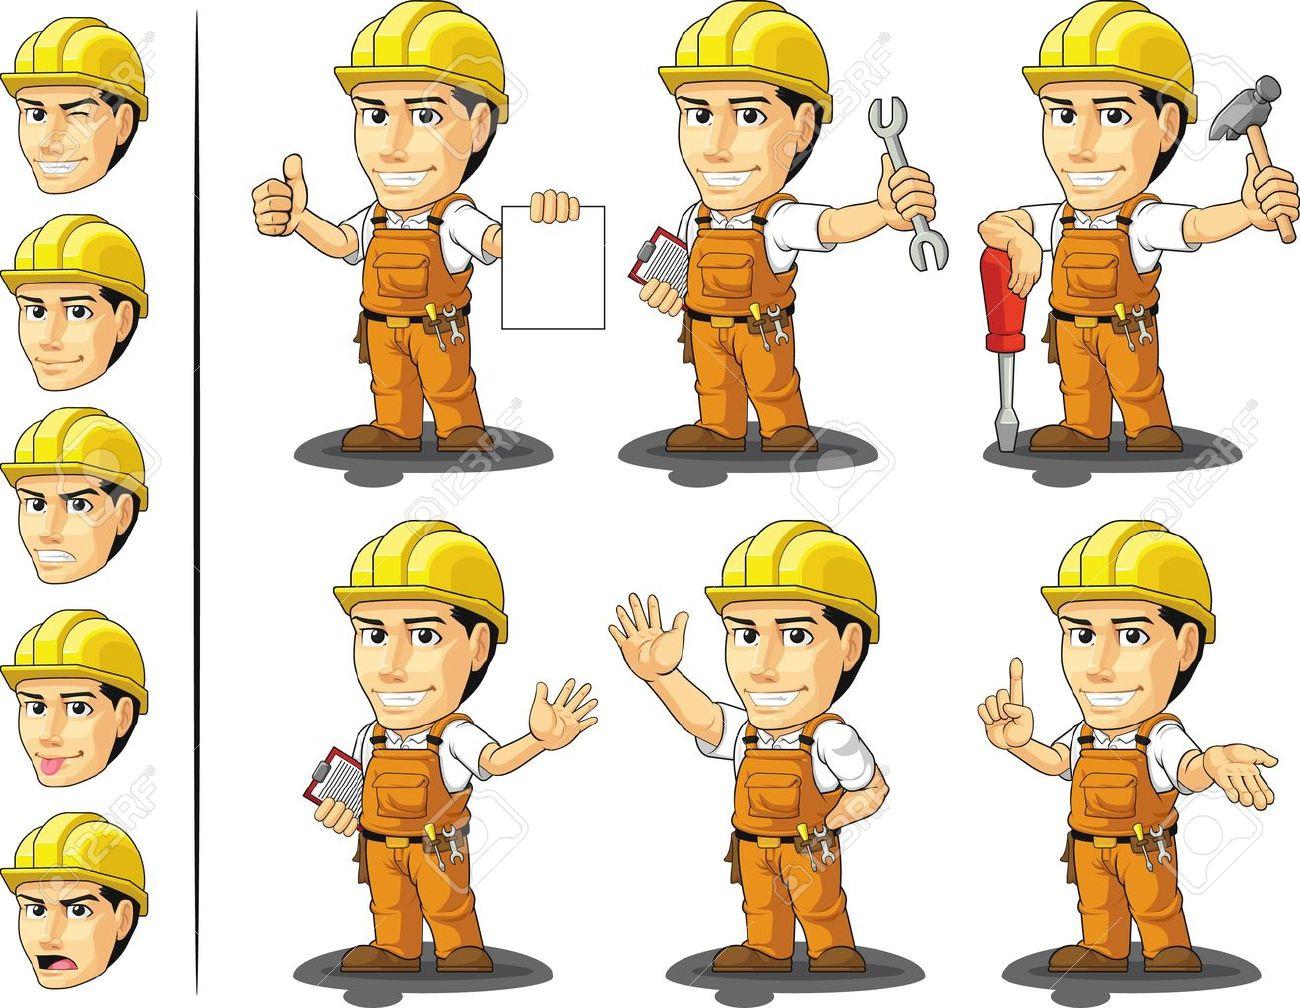 Industrial Construction Worker Mascot - 18758869